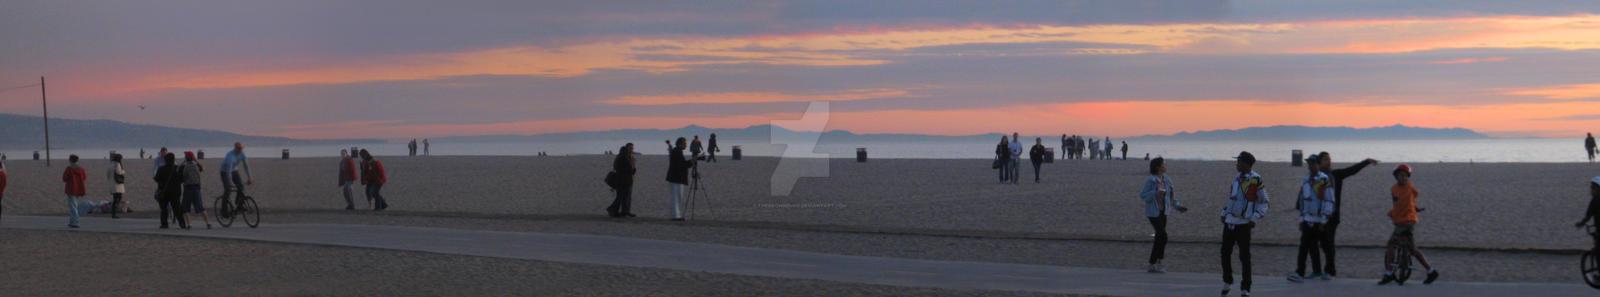 Sun Down on Santa Monica